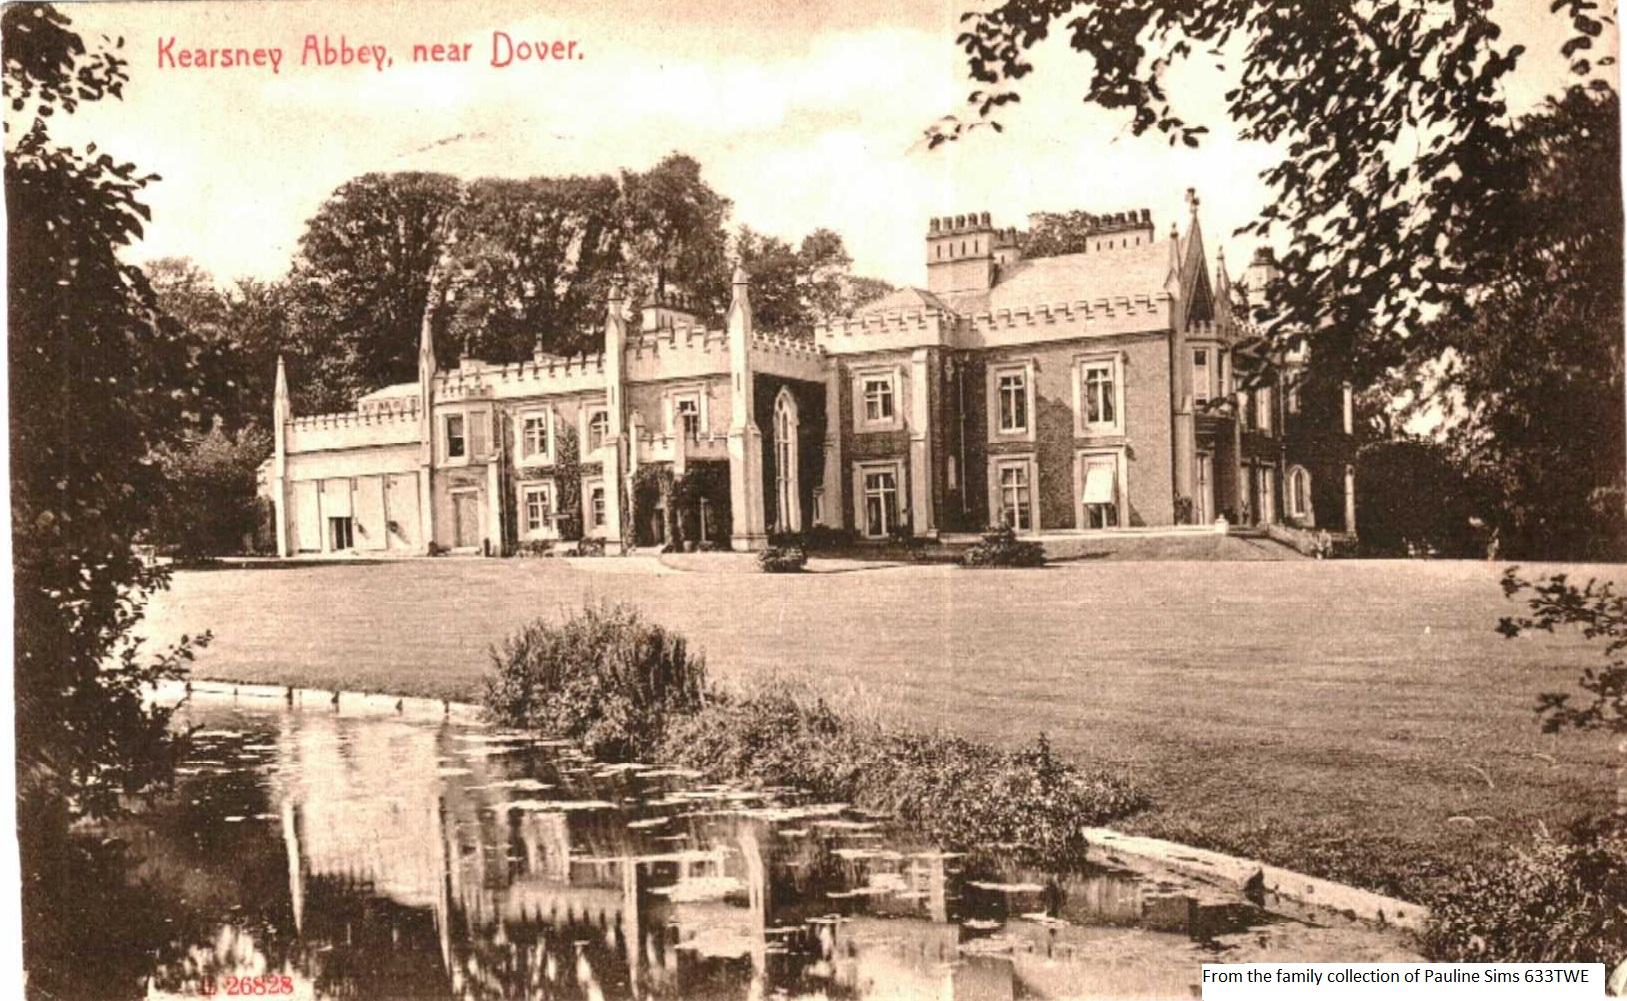 633twe-kearsney-abbey-near-dover-southborough-front